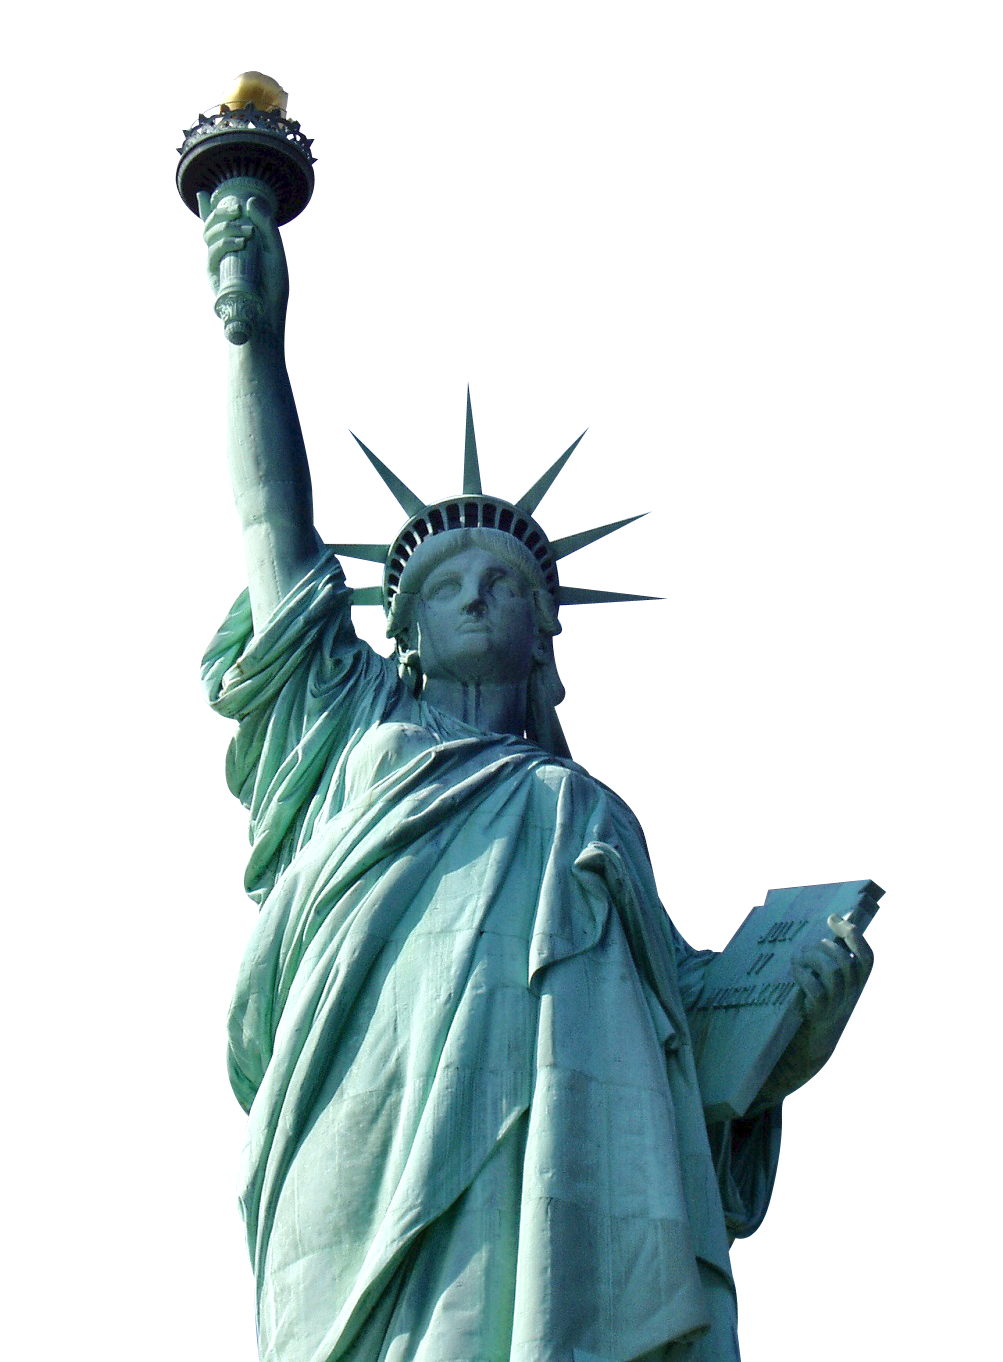 statue of liberty png image purepng free transparent cc0 png